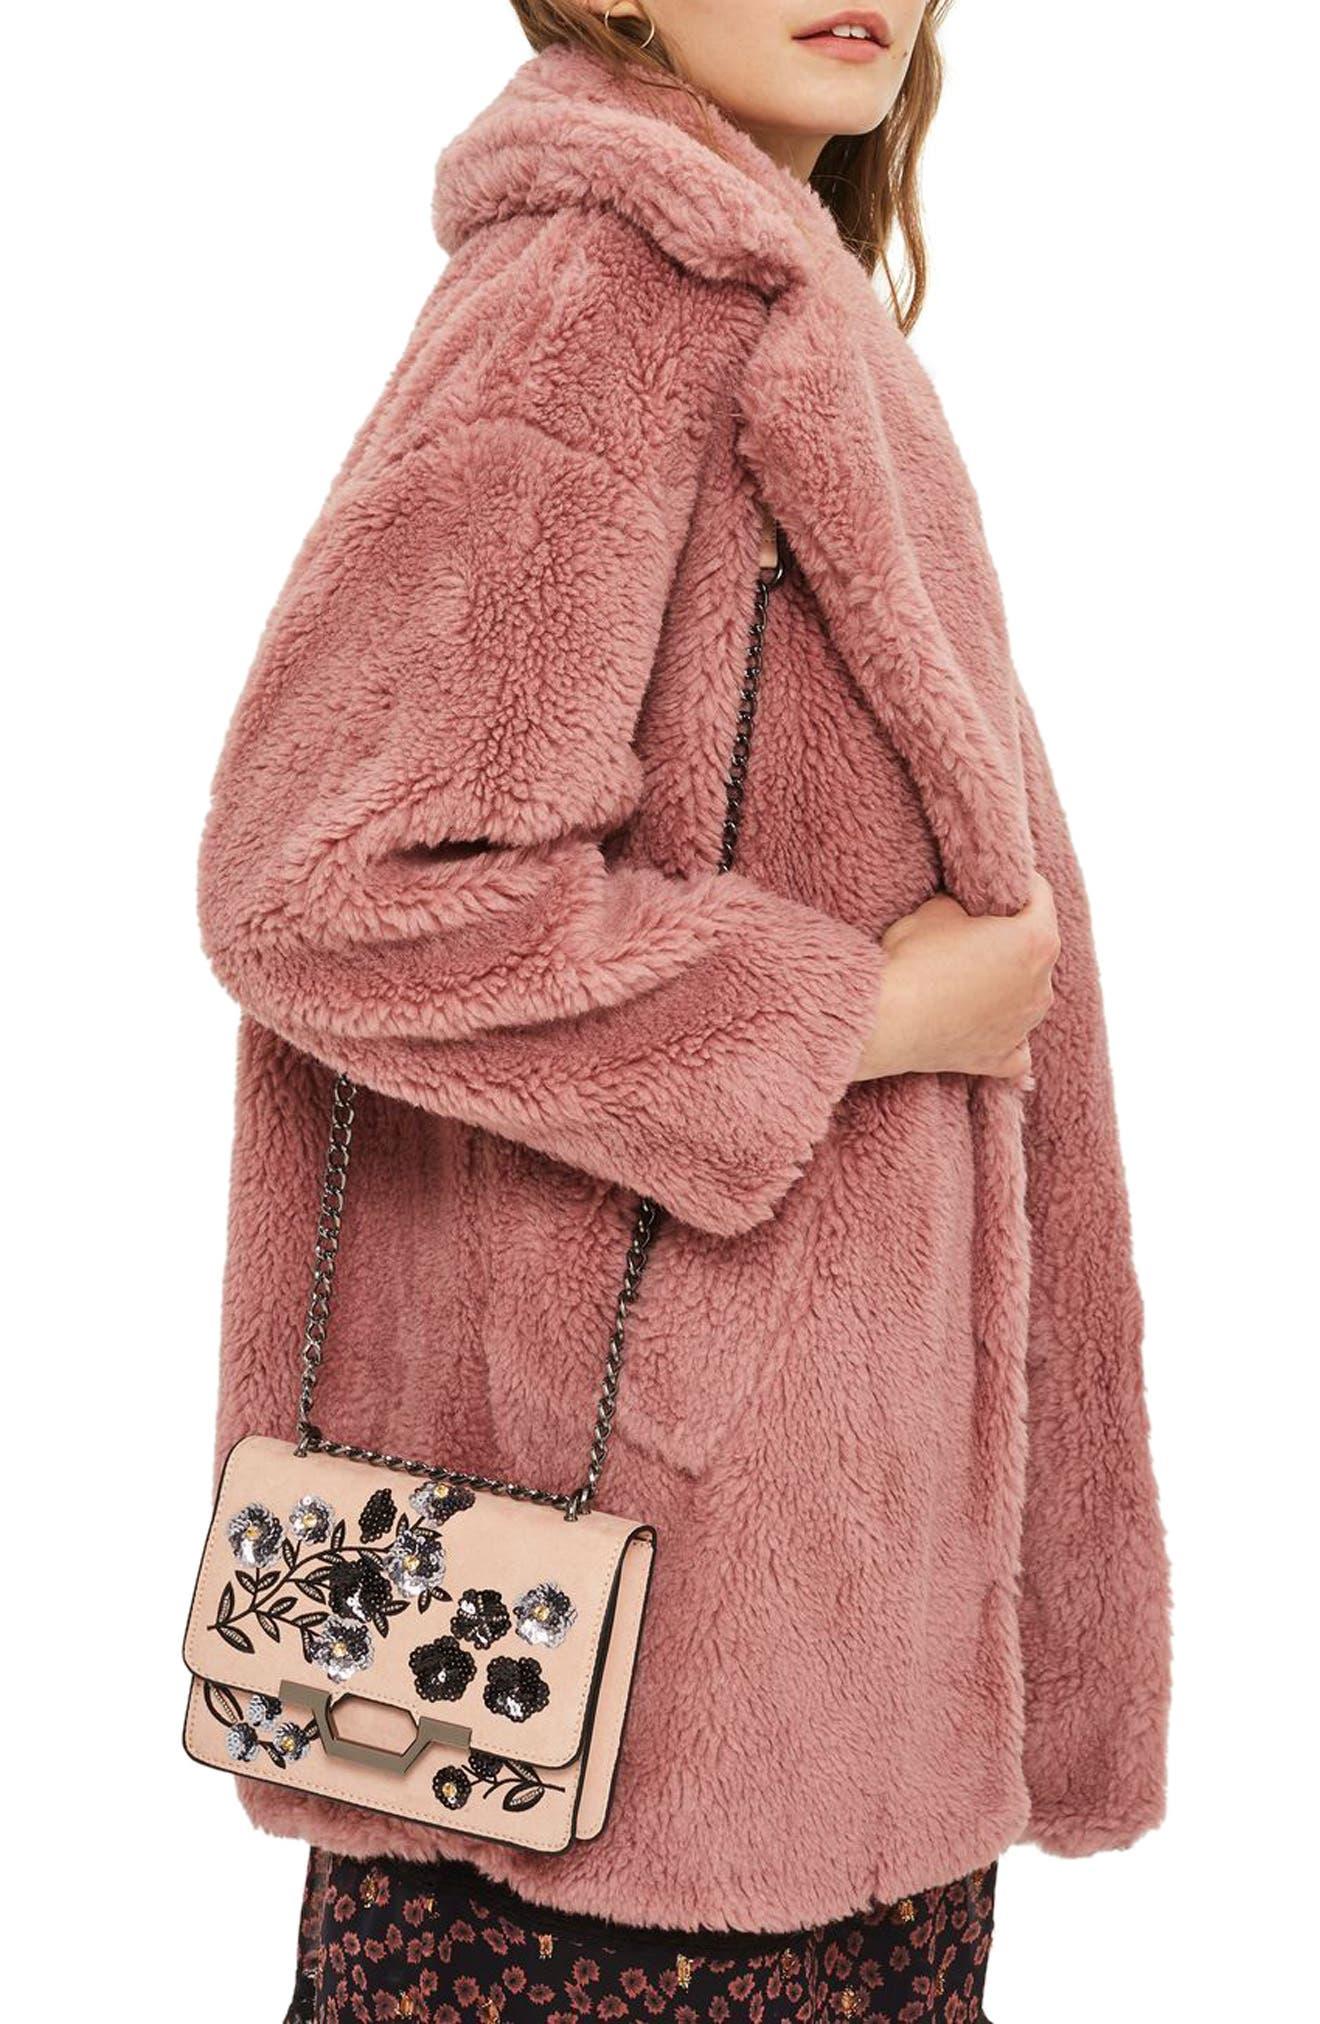 Kylie Embellished Faux Suede Crossbody Bag,                             Alternate thumbnail 4, color,